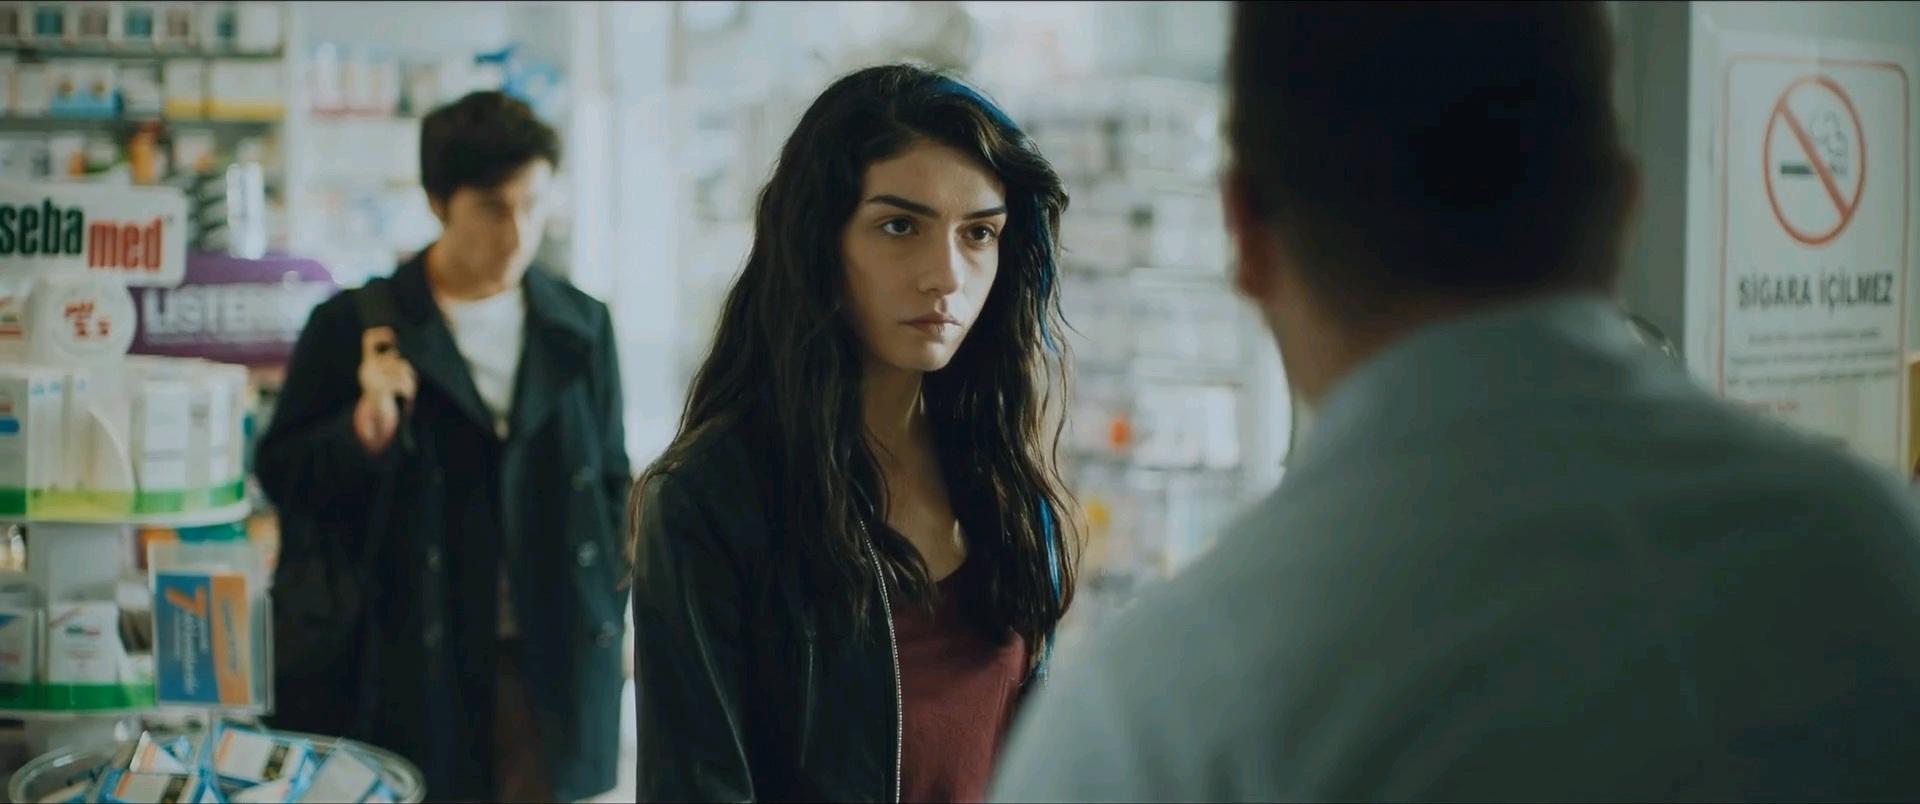 Kar | 2017 | Yerli Film | WEB-DL | XviD | Sansürsüz | 1080p - m720p - m1080p | WEB-DL | Tek Link